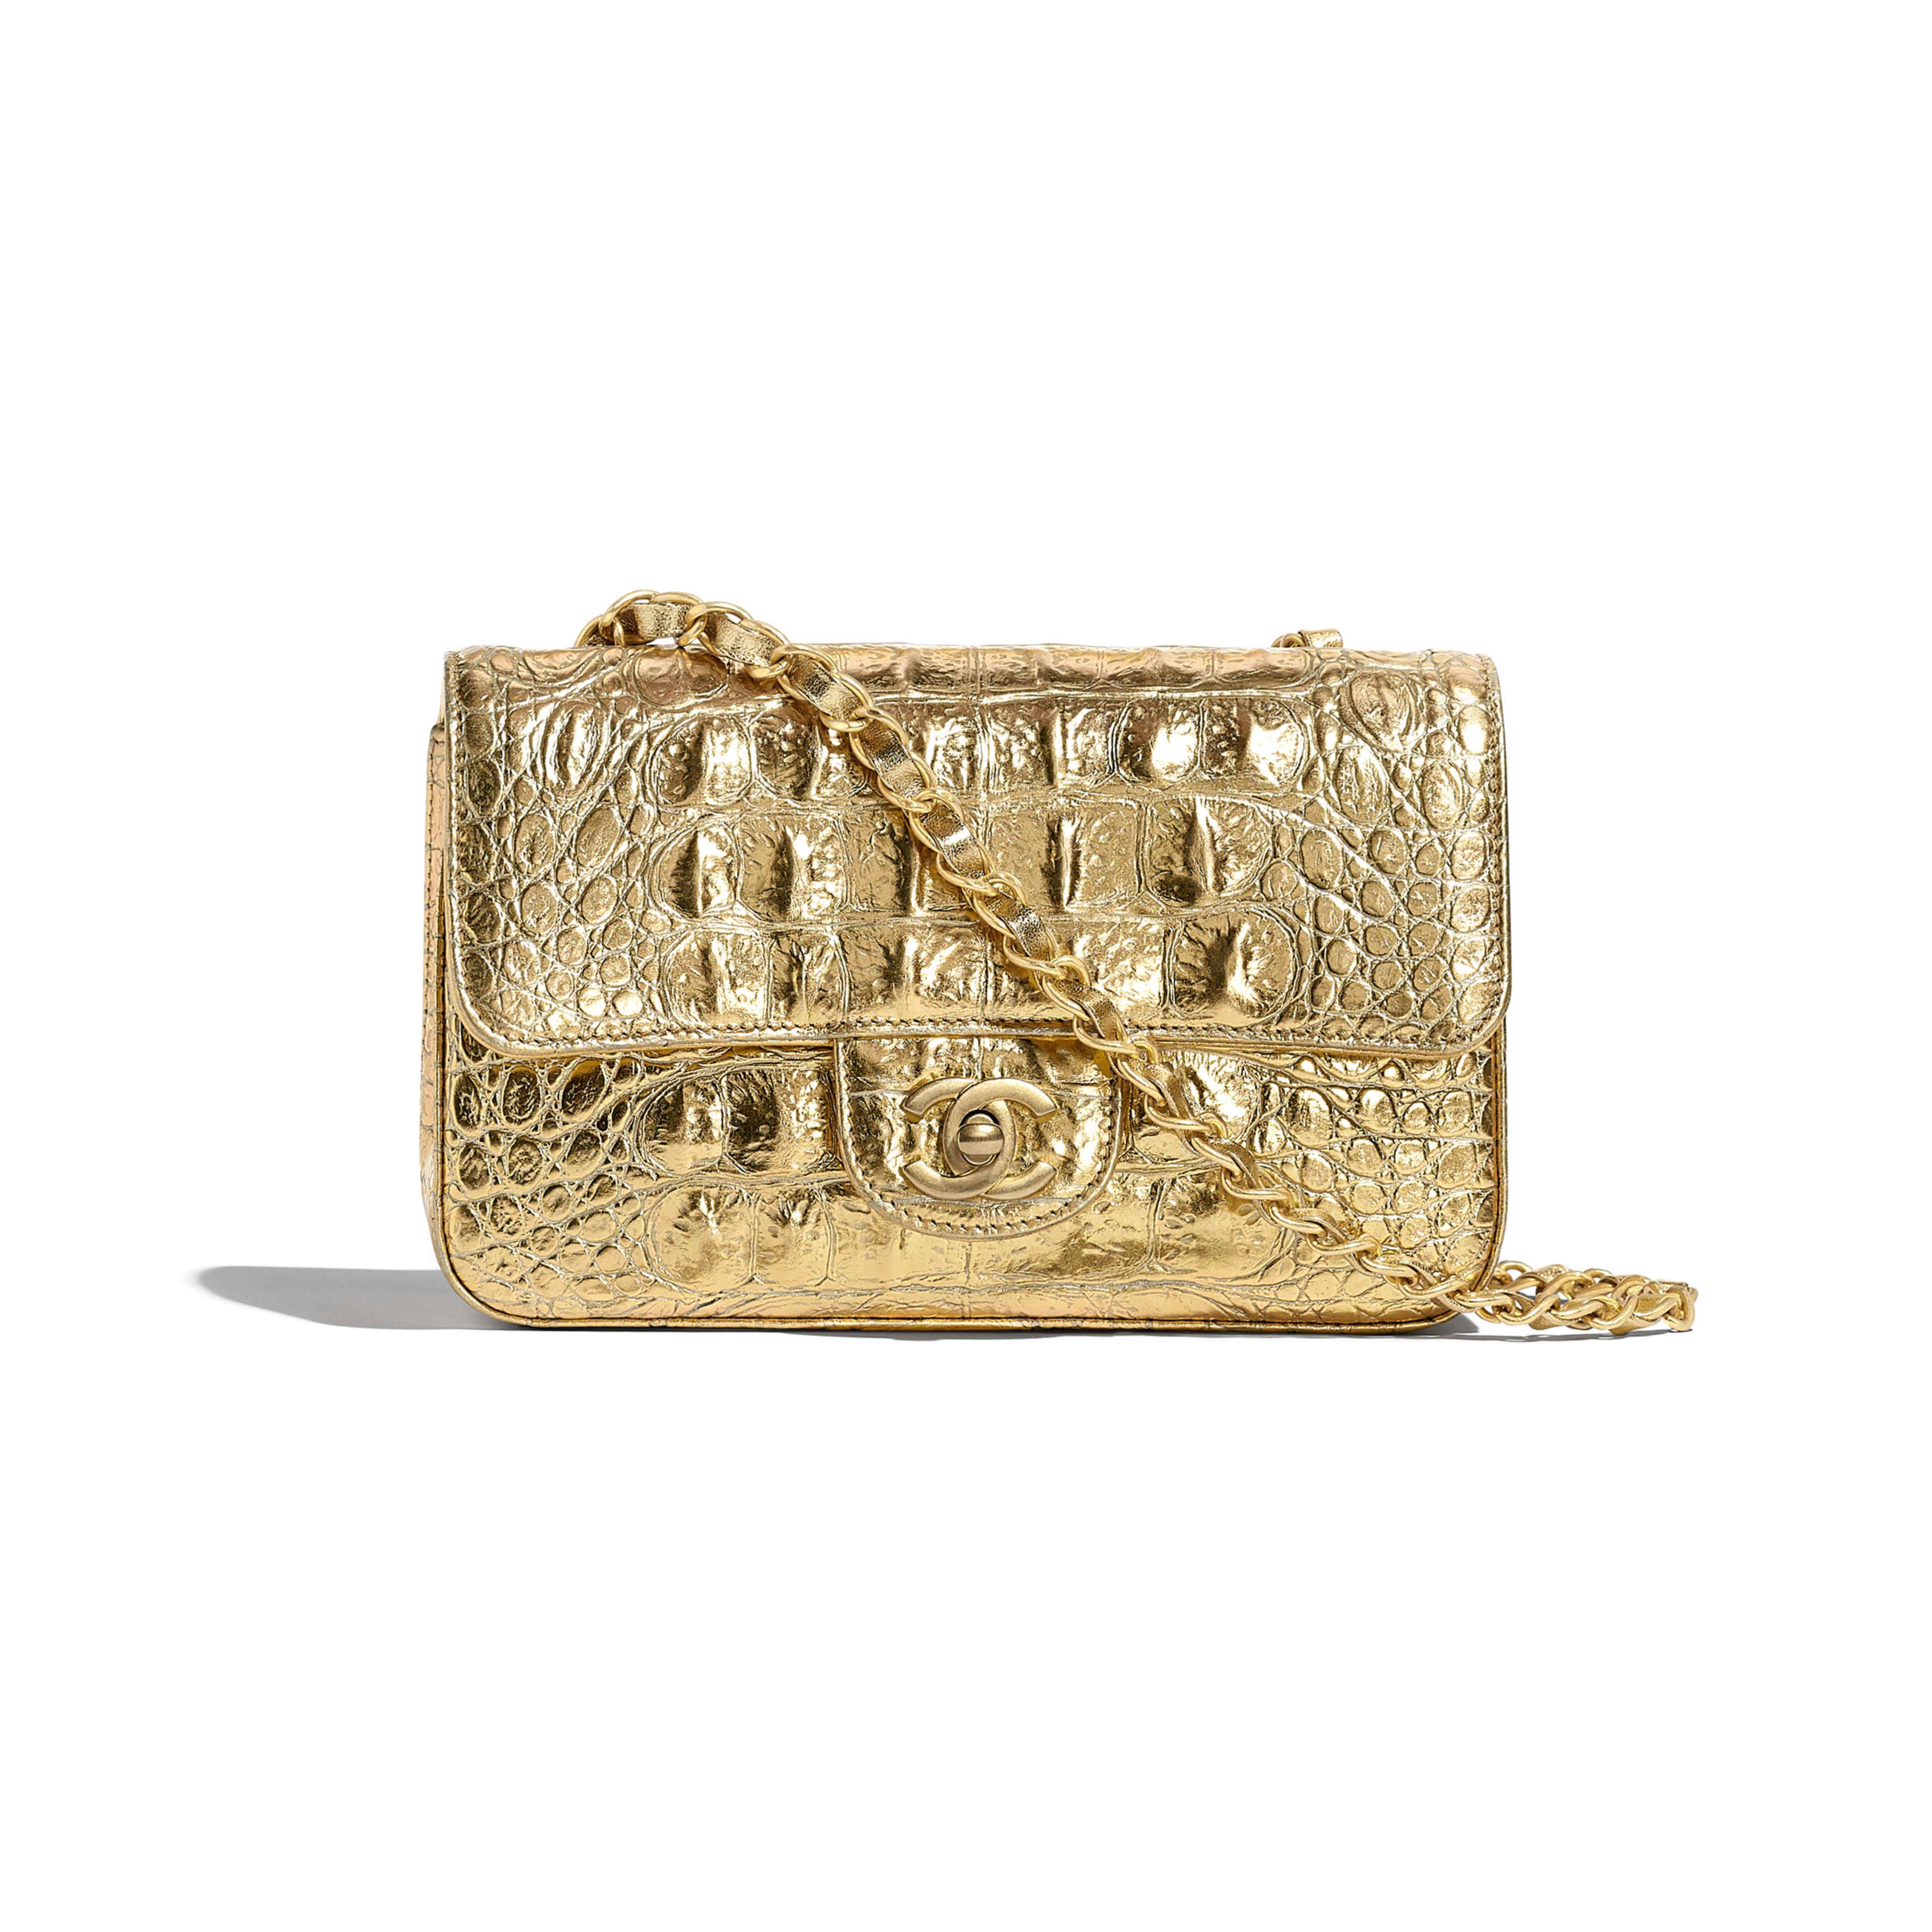 Mini Flap Bag - Gold - Metallic Crocodile Embossed Calfskin & Gold Metal - Default view - see full sized version